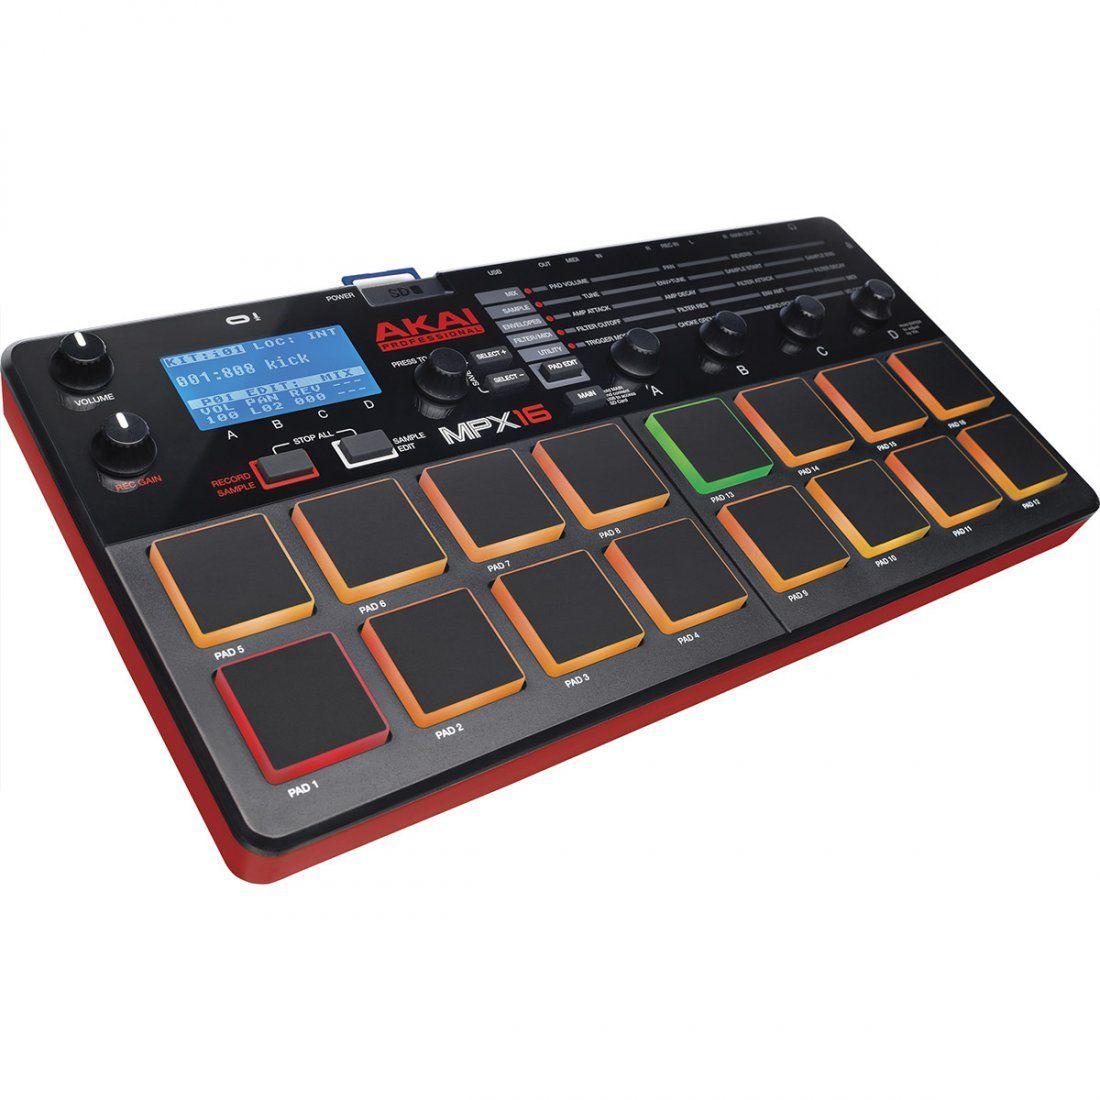 Akai MPX16 Controladora Produção MPX 16  Sampler 16-Pads Midi Beatmaker